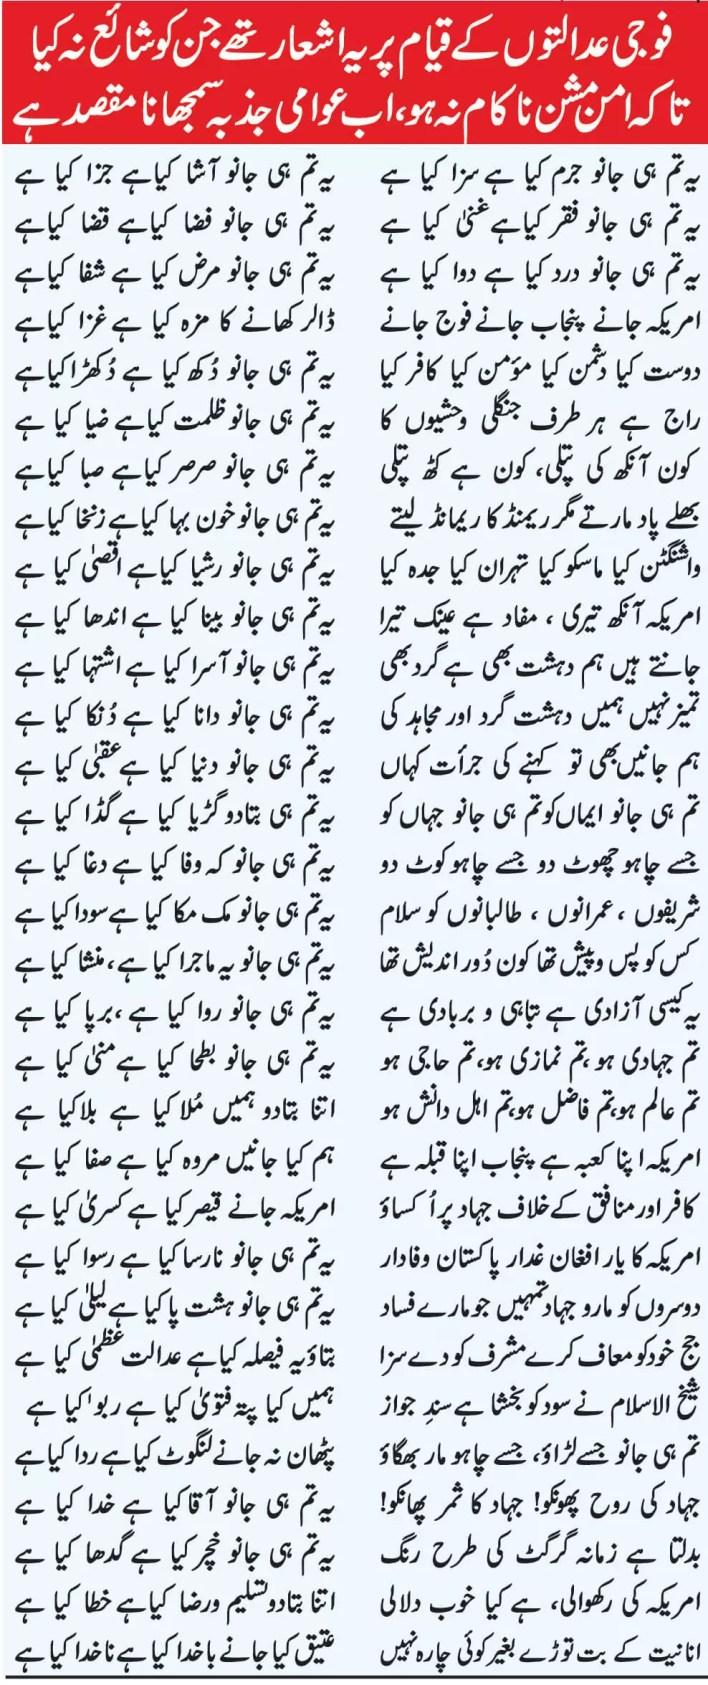 talibanization-jmaat-e-islami-moscow-washington-tehran-mujahid-ramen-davis-dehshat-gardi-2